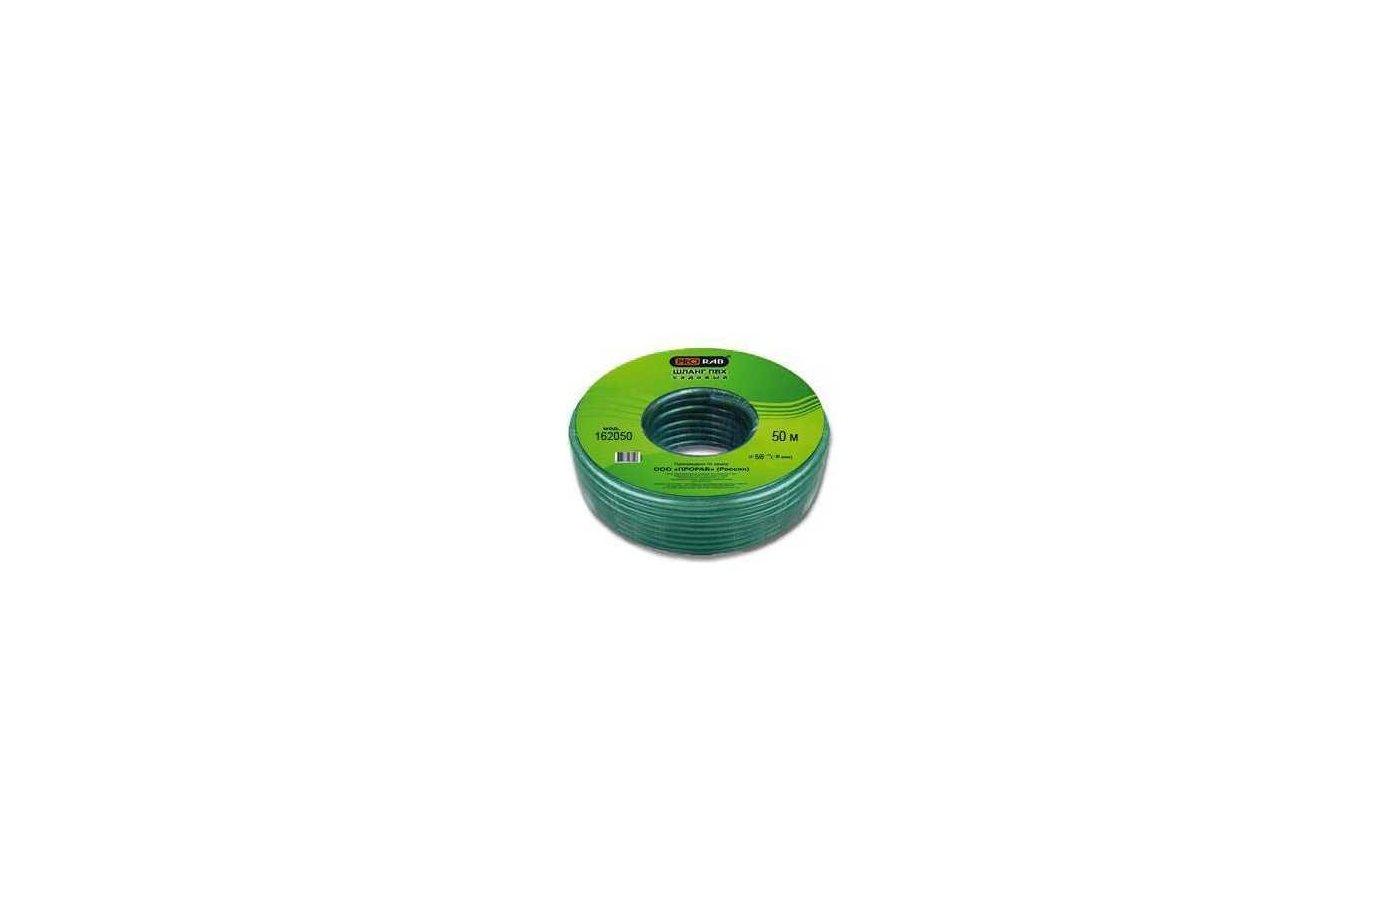 "Поливочное оборудование Prorab 162050  Шланг ПВХ для полива, диаметр 5/8"", 50 м  Hobby"